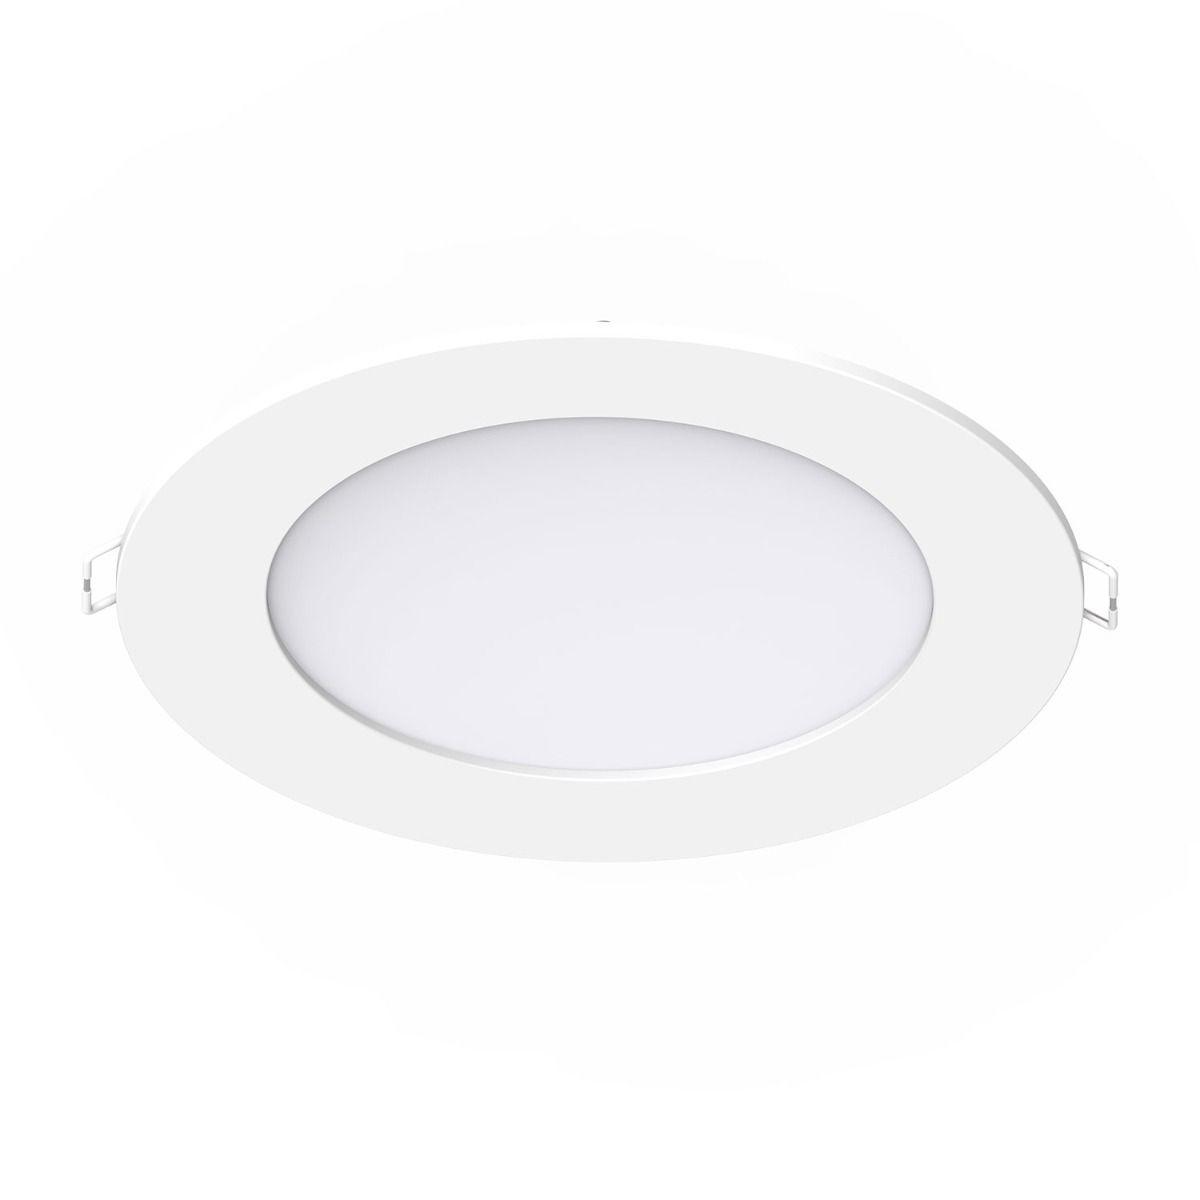 Noxion LEDDownlight SlimV2.0IP44 12W 3000K Cutout Ø150mm w/ EM3HR